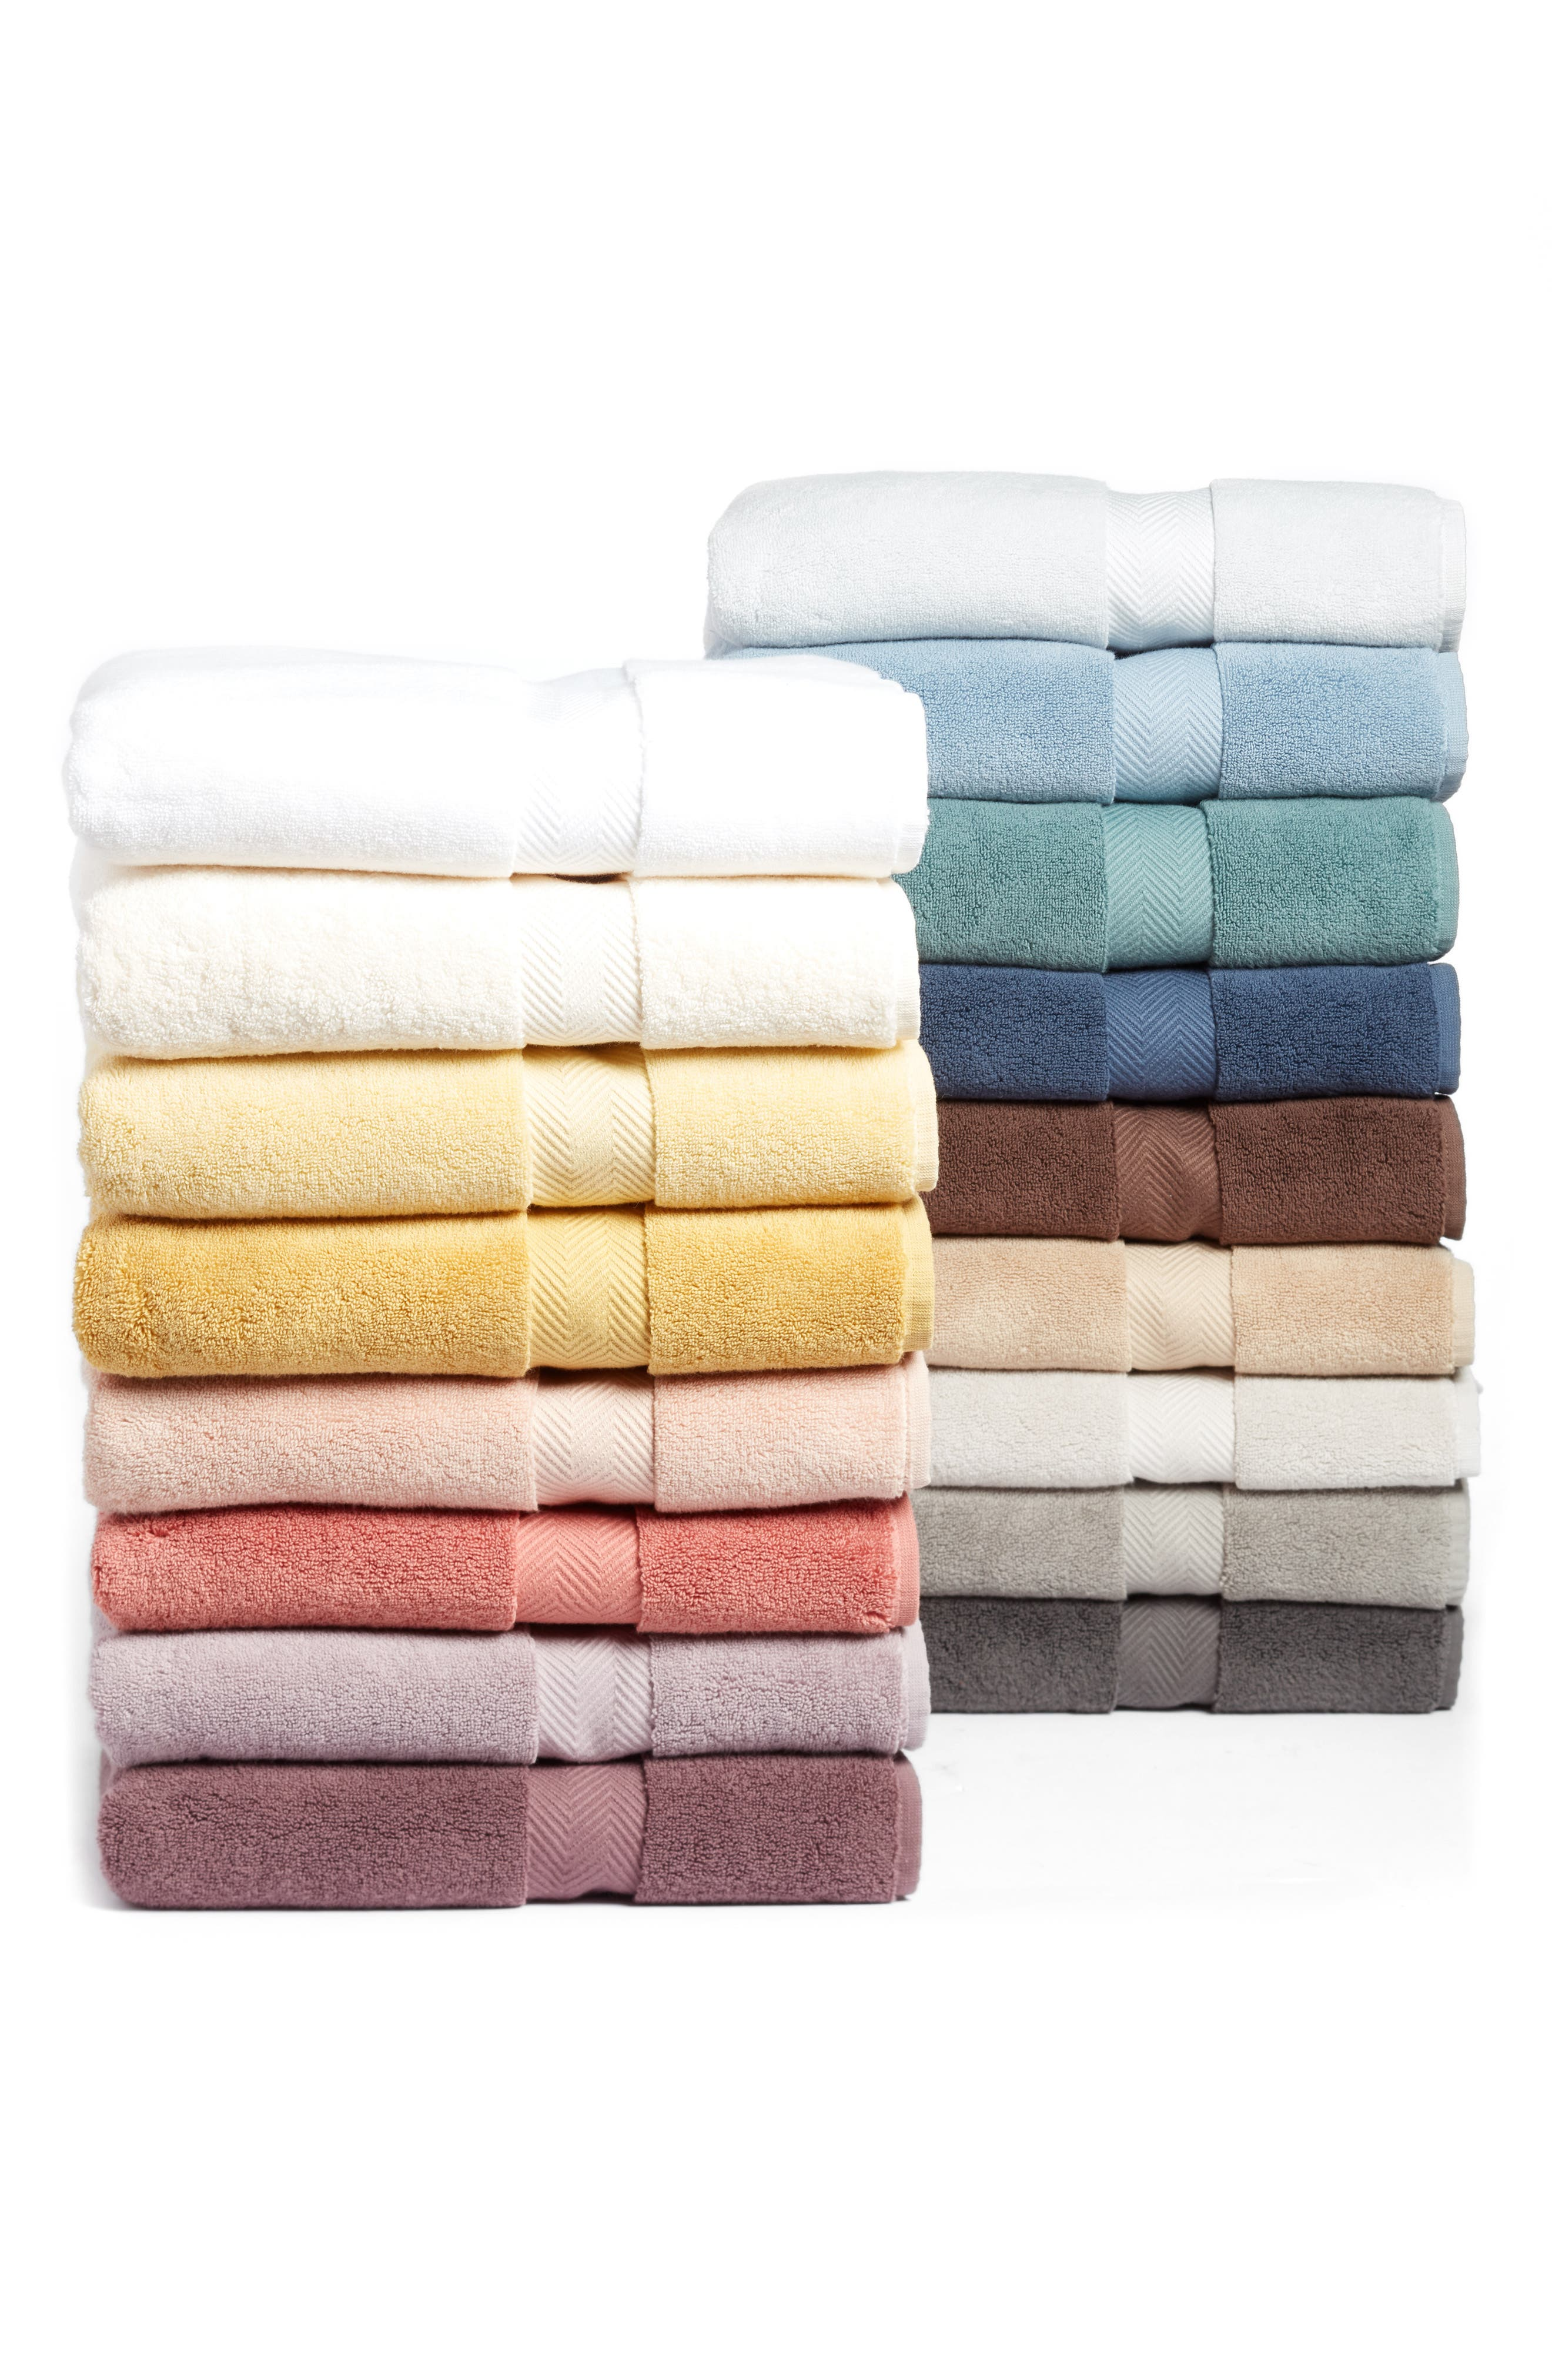 Hydrocotton Bath Towel,                             Alternate thumbnail 3, color,                             061